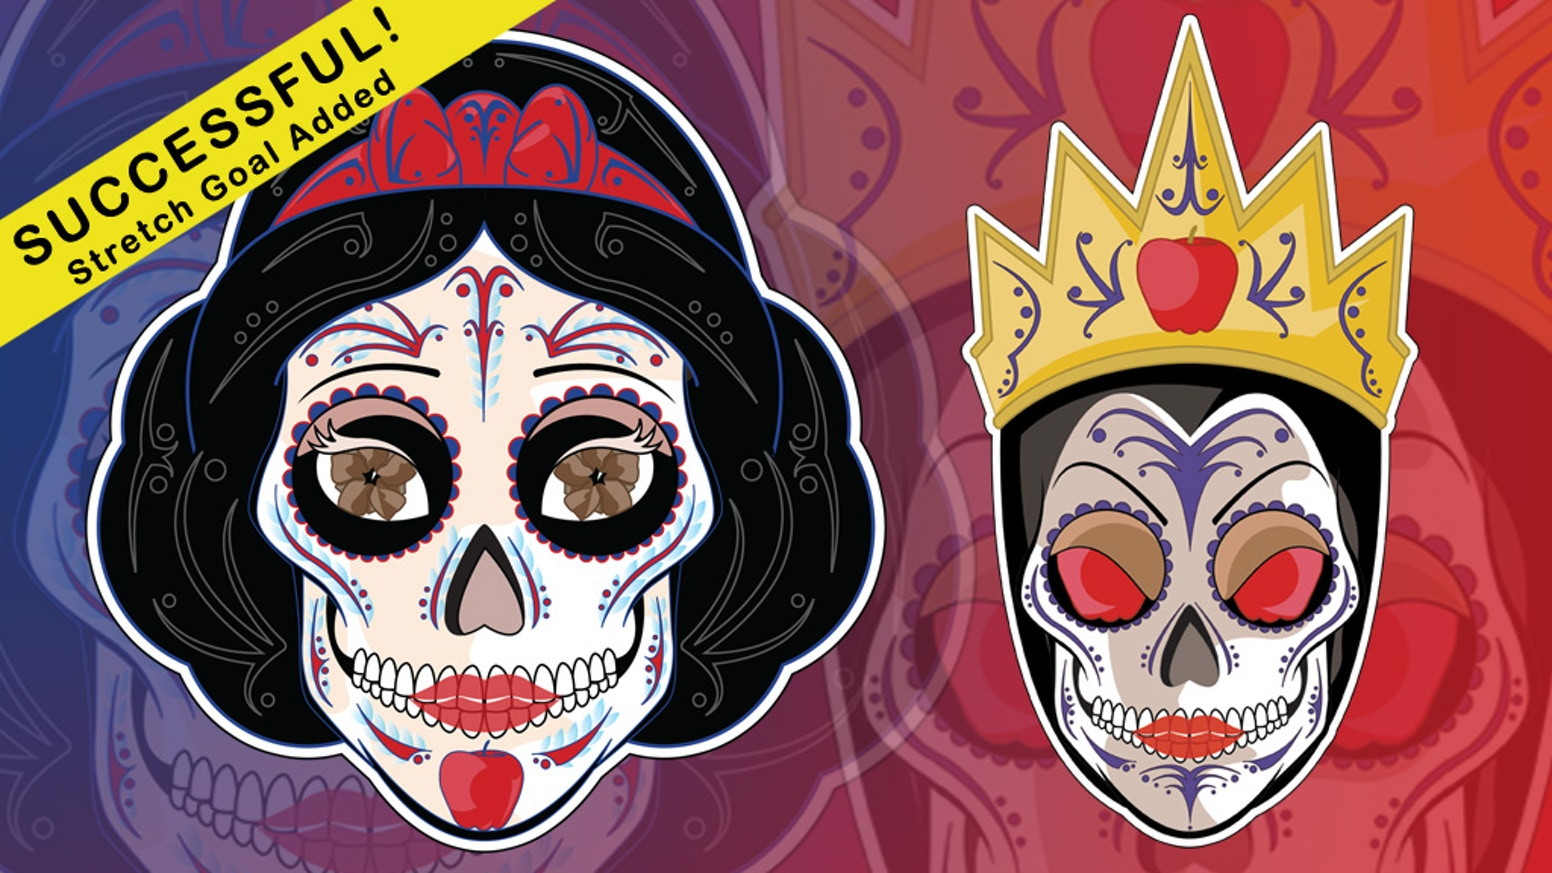 Snow White Evil Queen Sugar Skull Stickers By Mickel Yantz